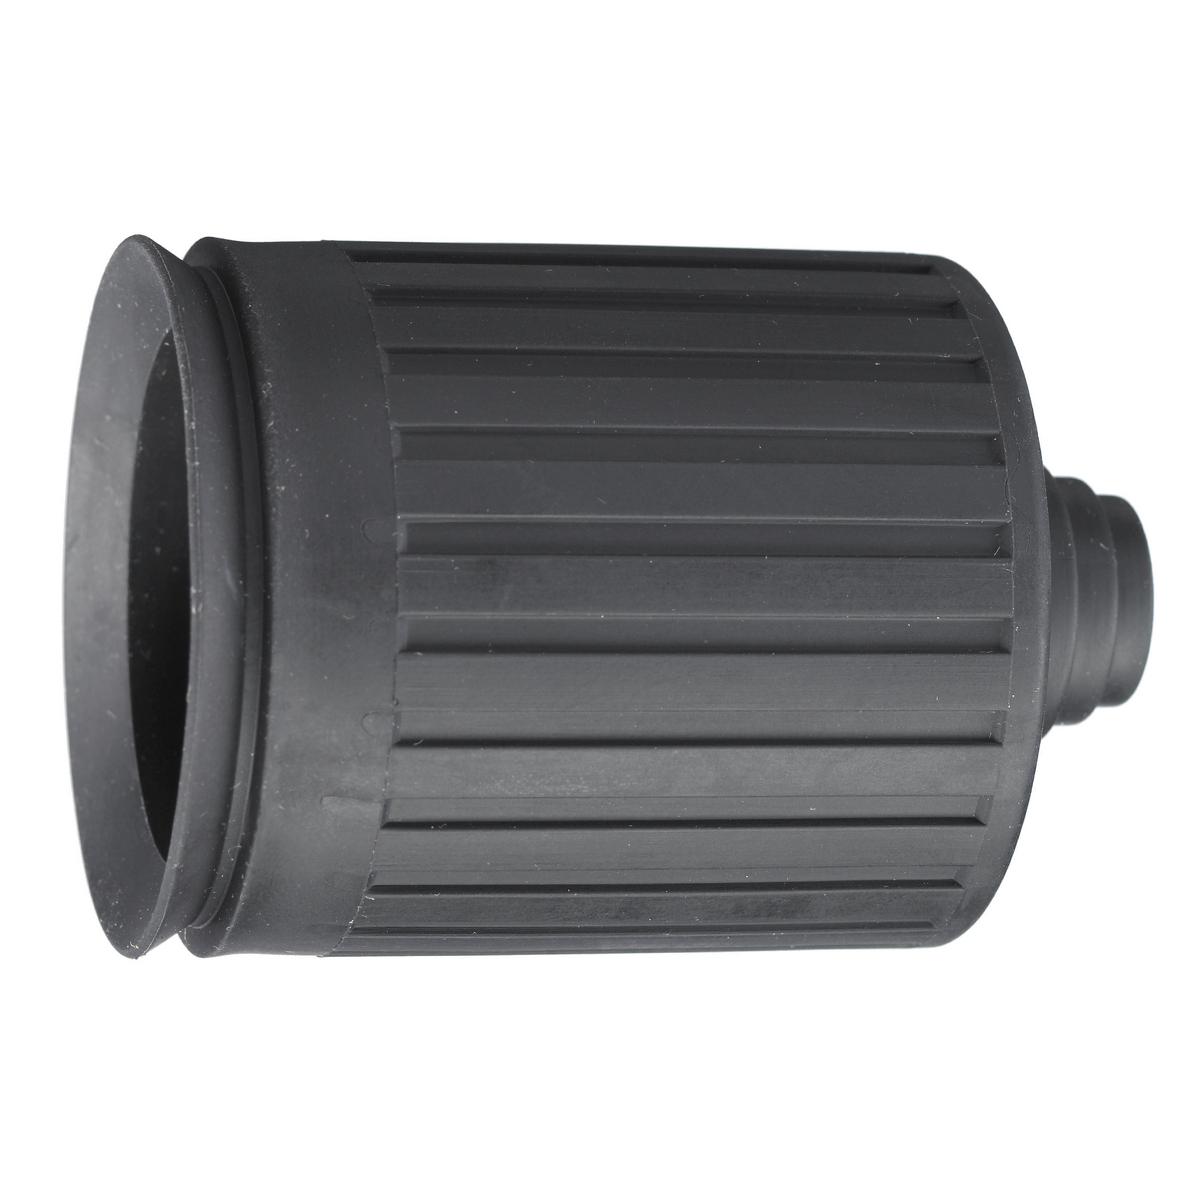 Hubbell HBL6023 Black Straight Blade Weatherproof Boot